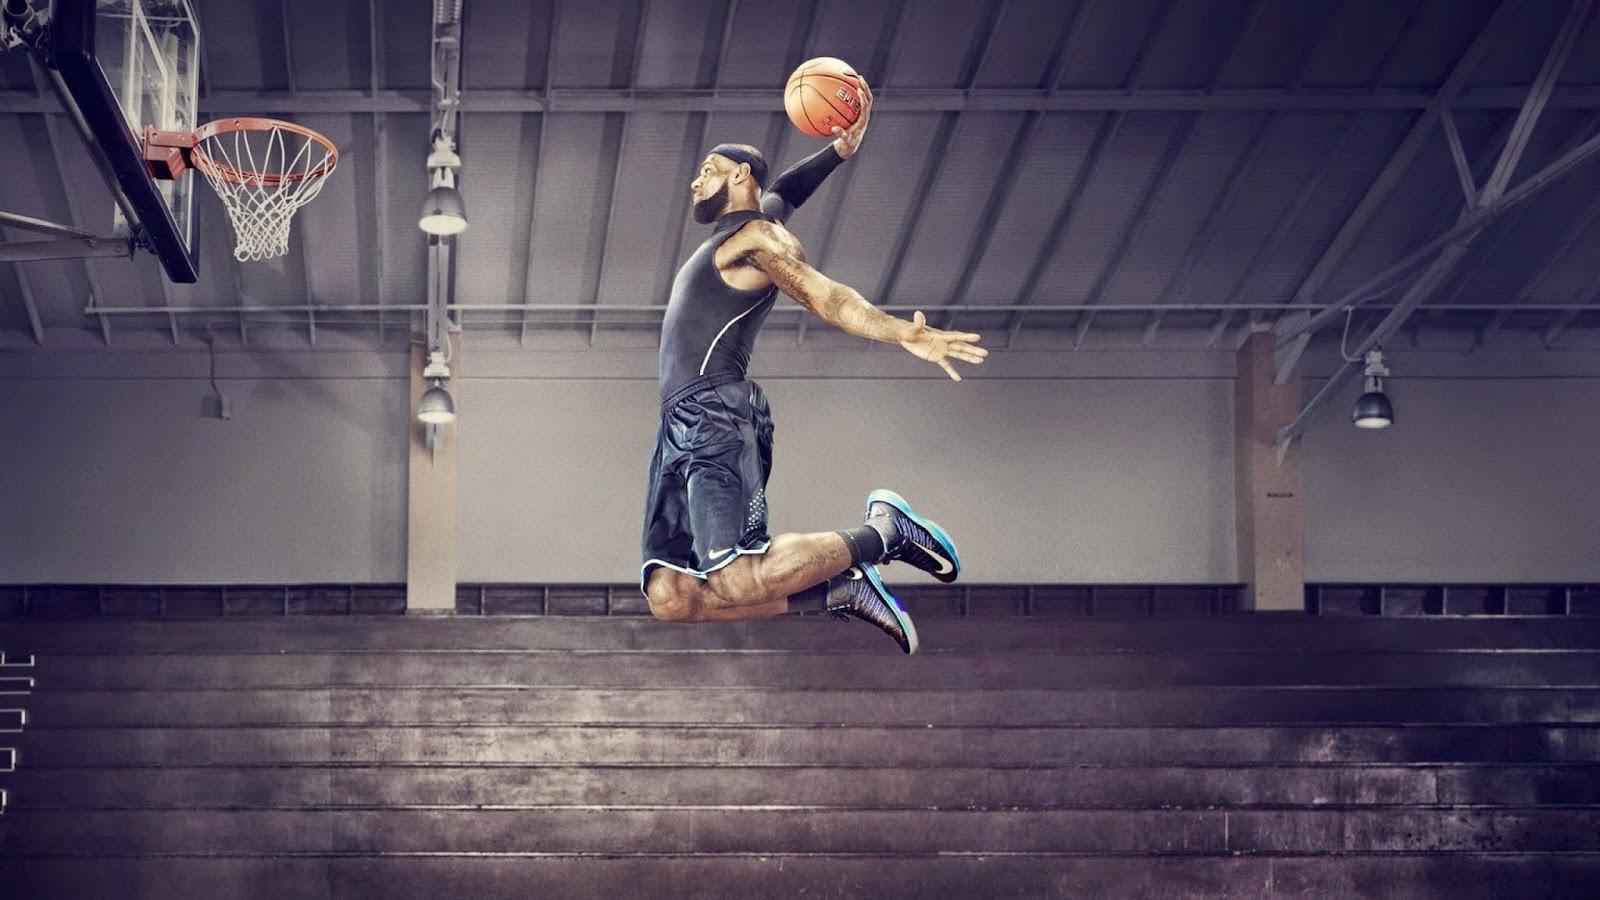 Desktop Wallpaper    Gallery    Miscellaneous    Nike Basketball